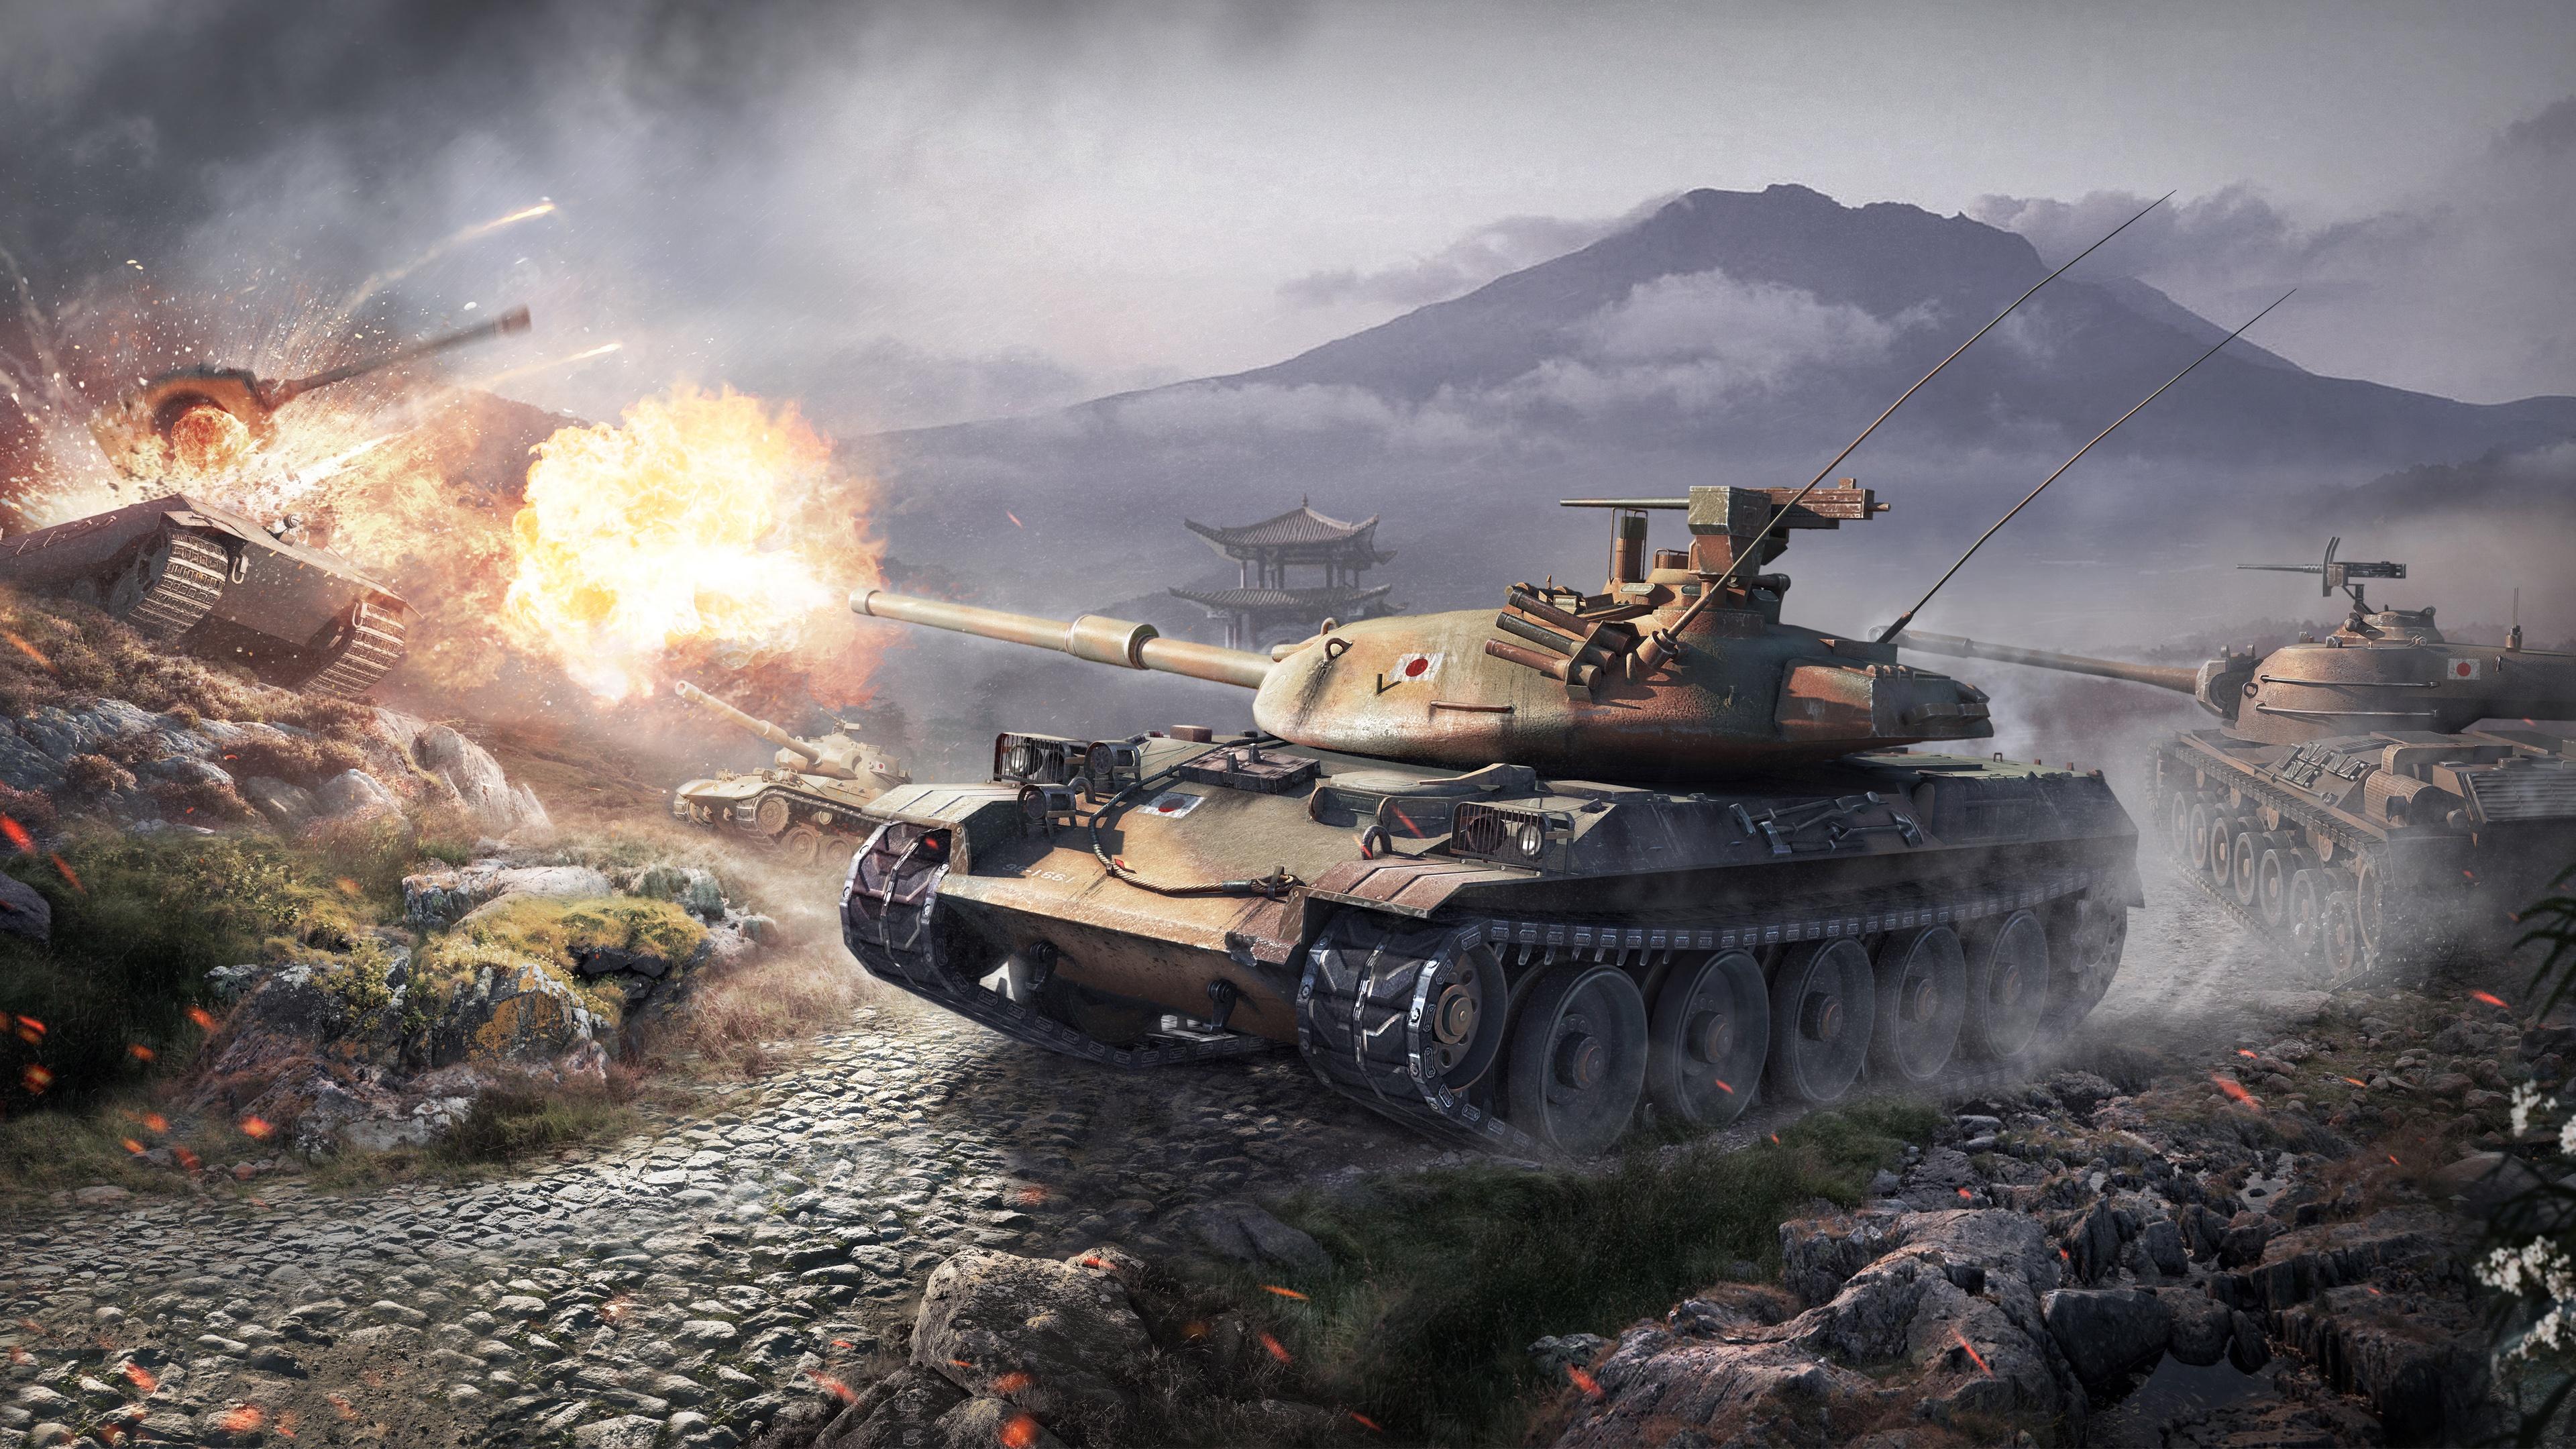 world of tanks 1535966032 - World Of Tanks - xbox games wallpapers, world of tanks wallpapers, games wallpapers